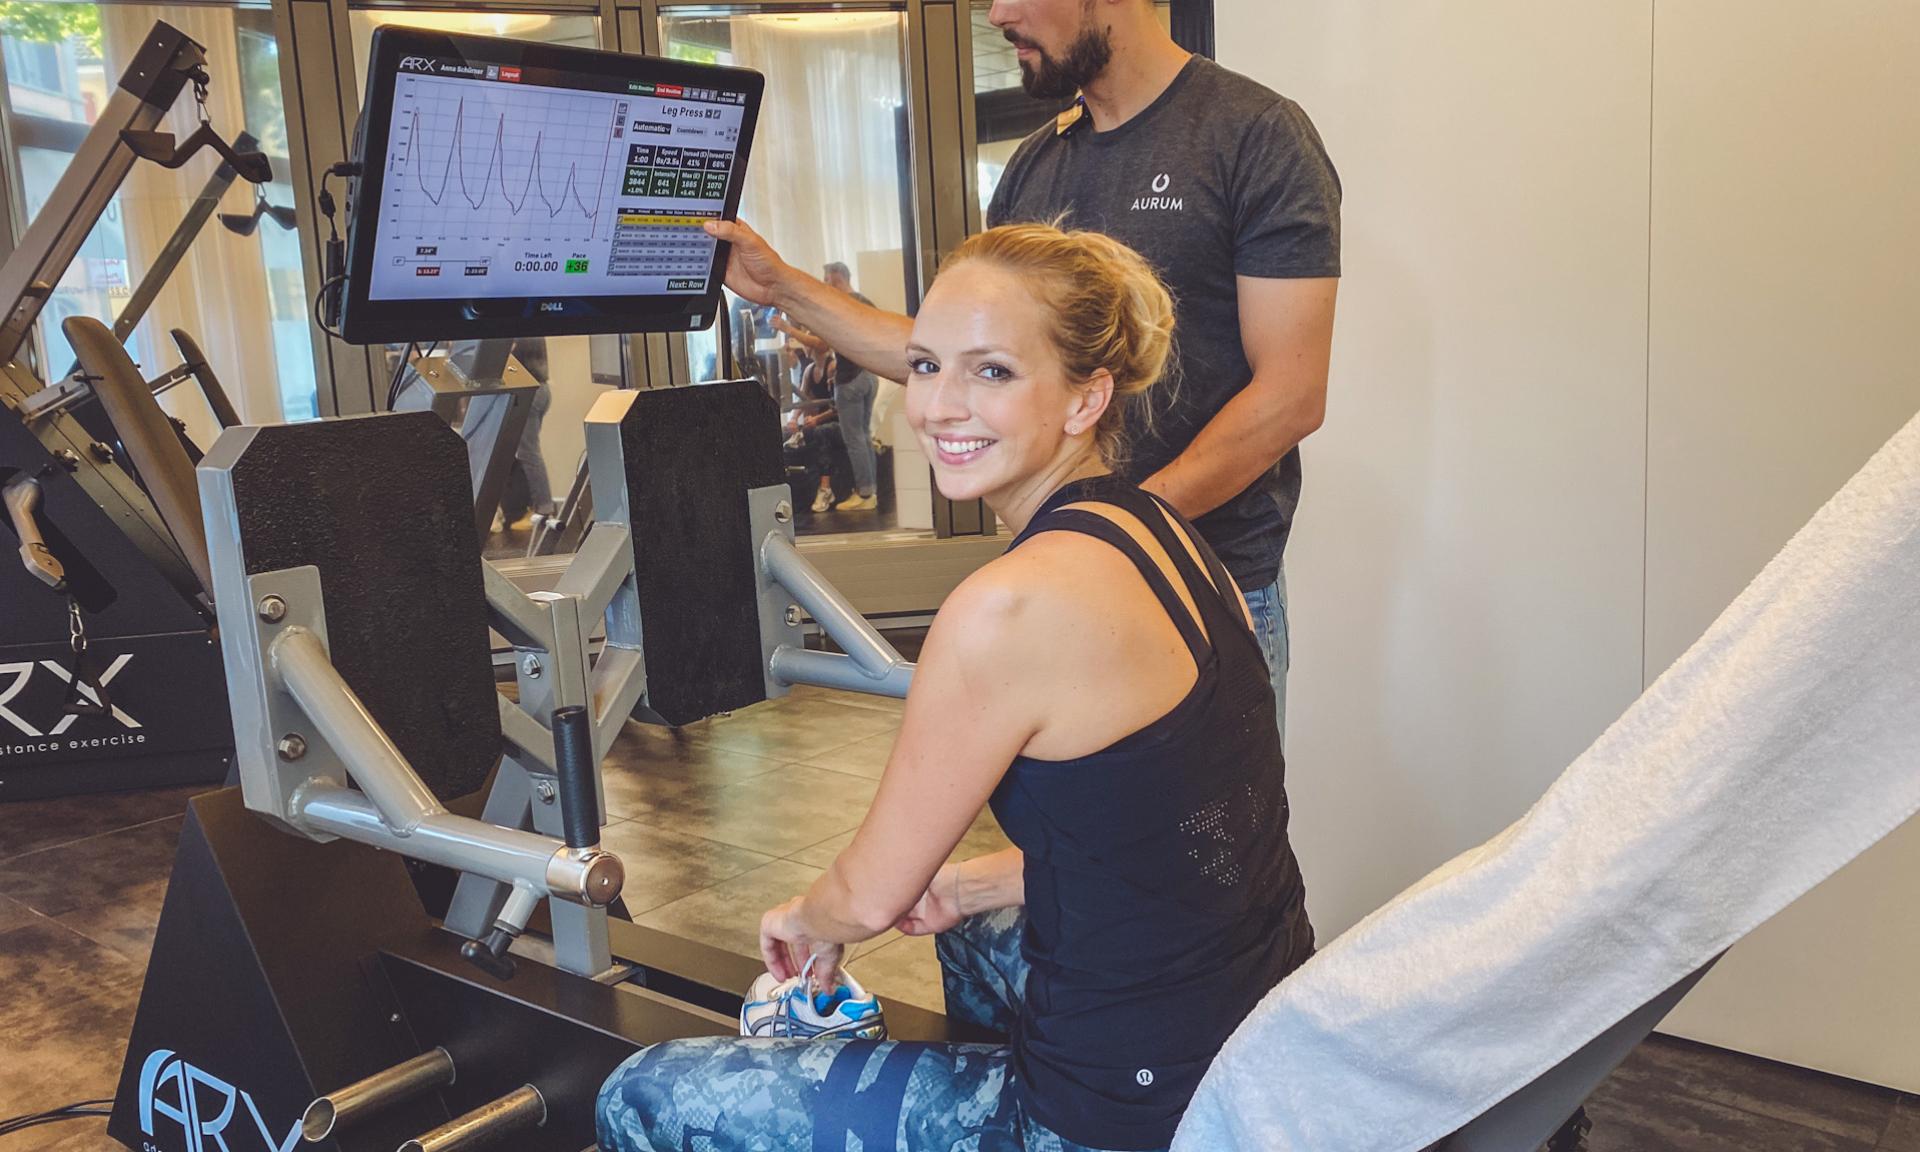 Cardiovascular diseases: How does strength training improve heart health?